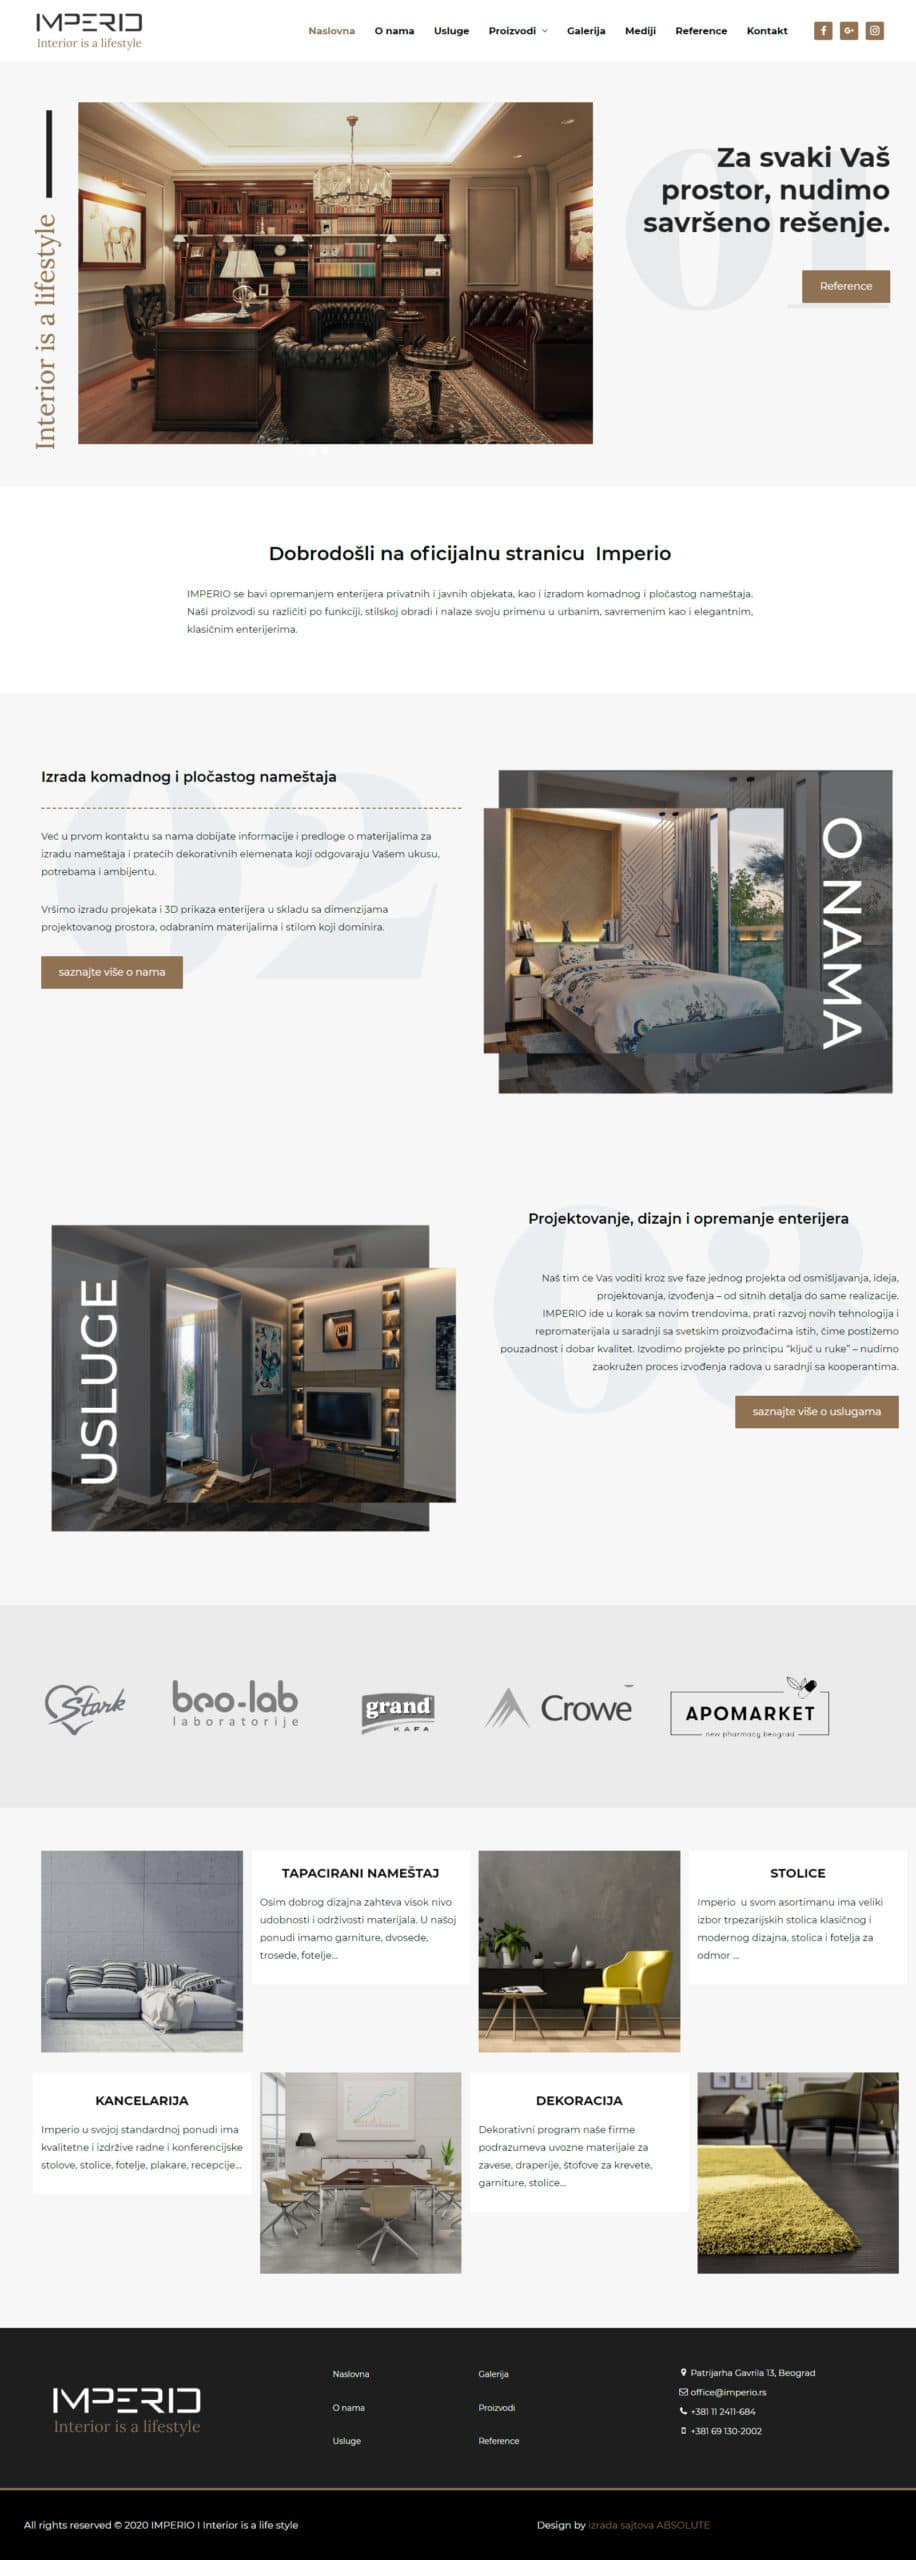 izrada-sajta-imperio-rs